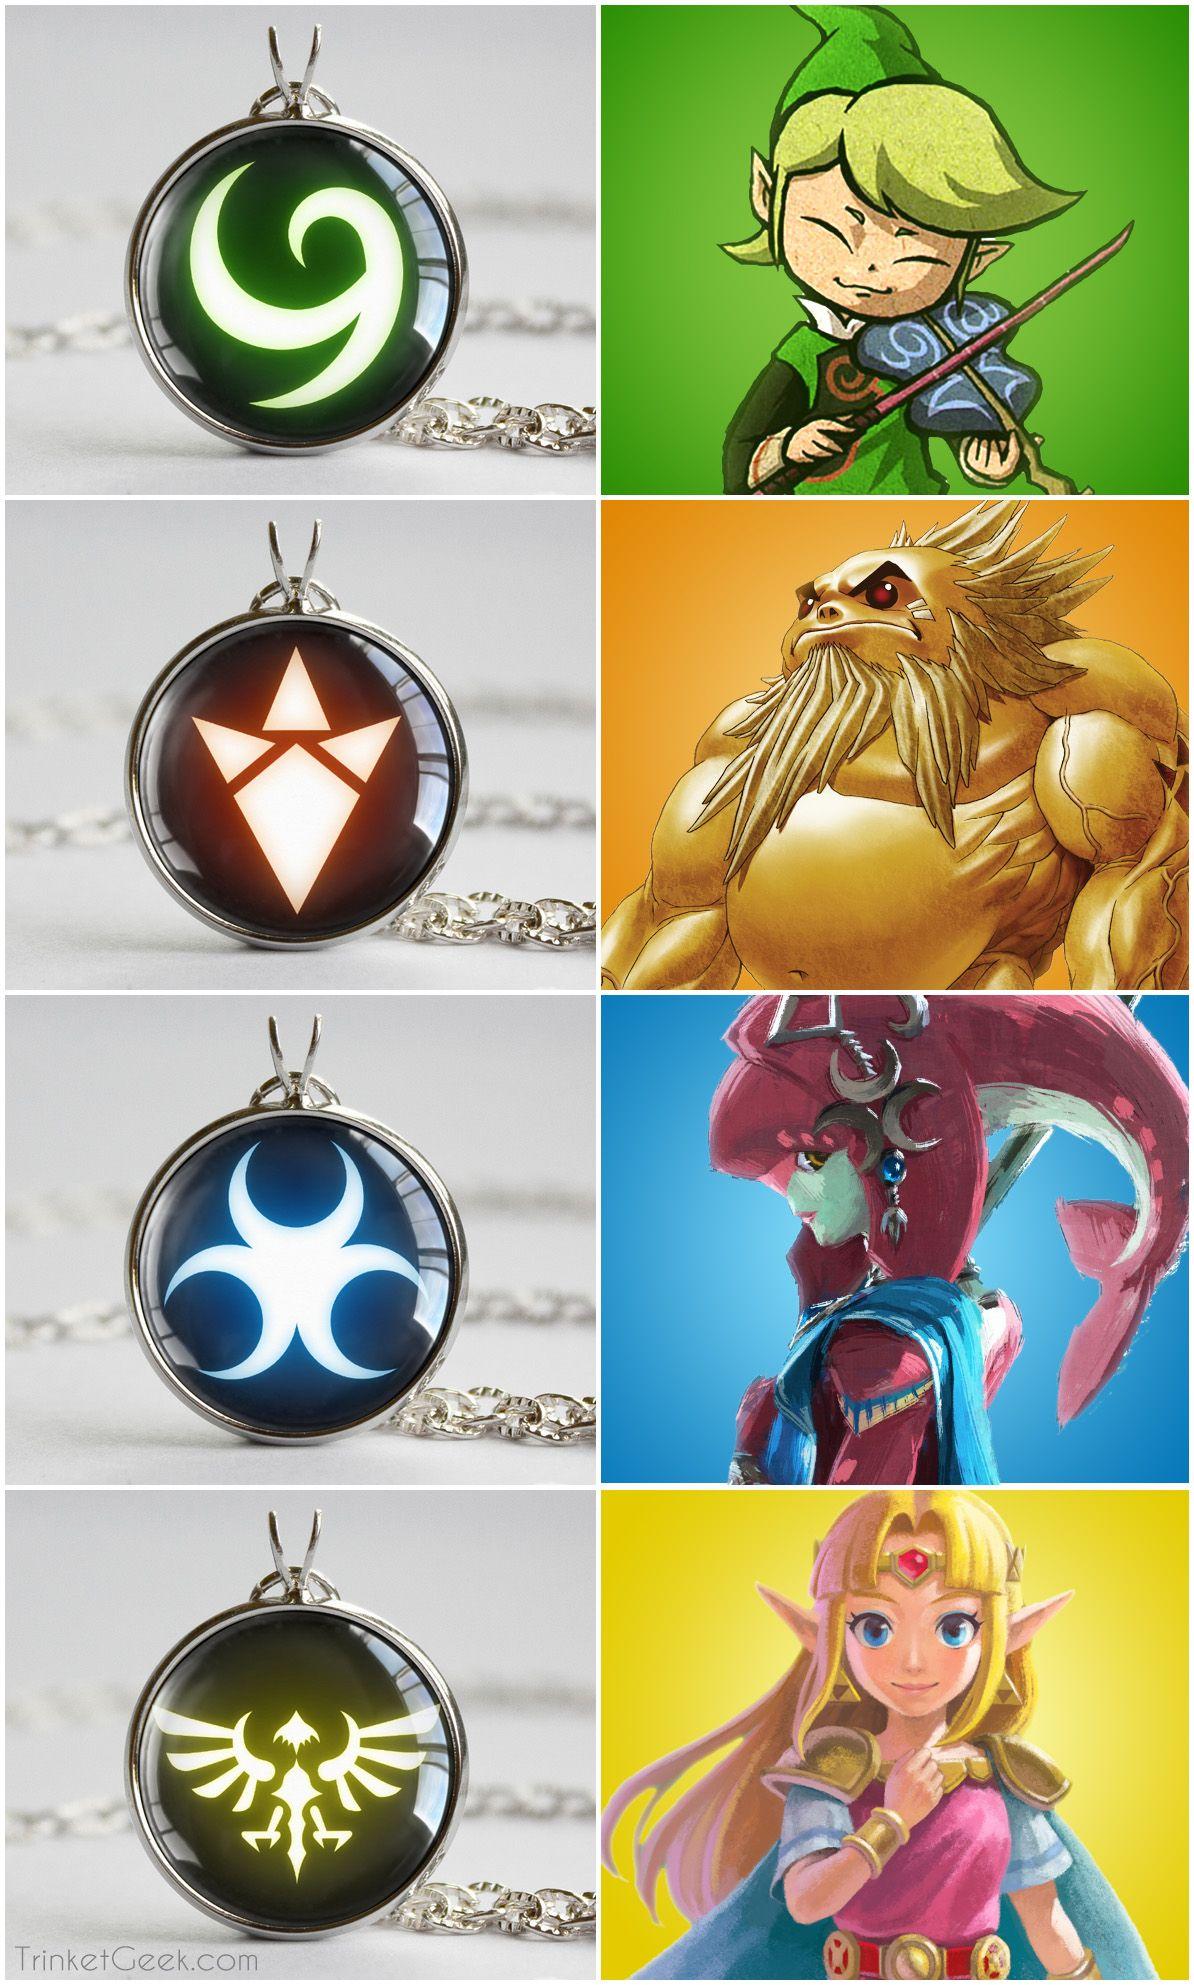 zelda race symbol pendants nintendo symbols and video games